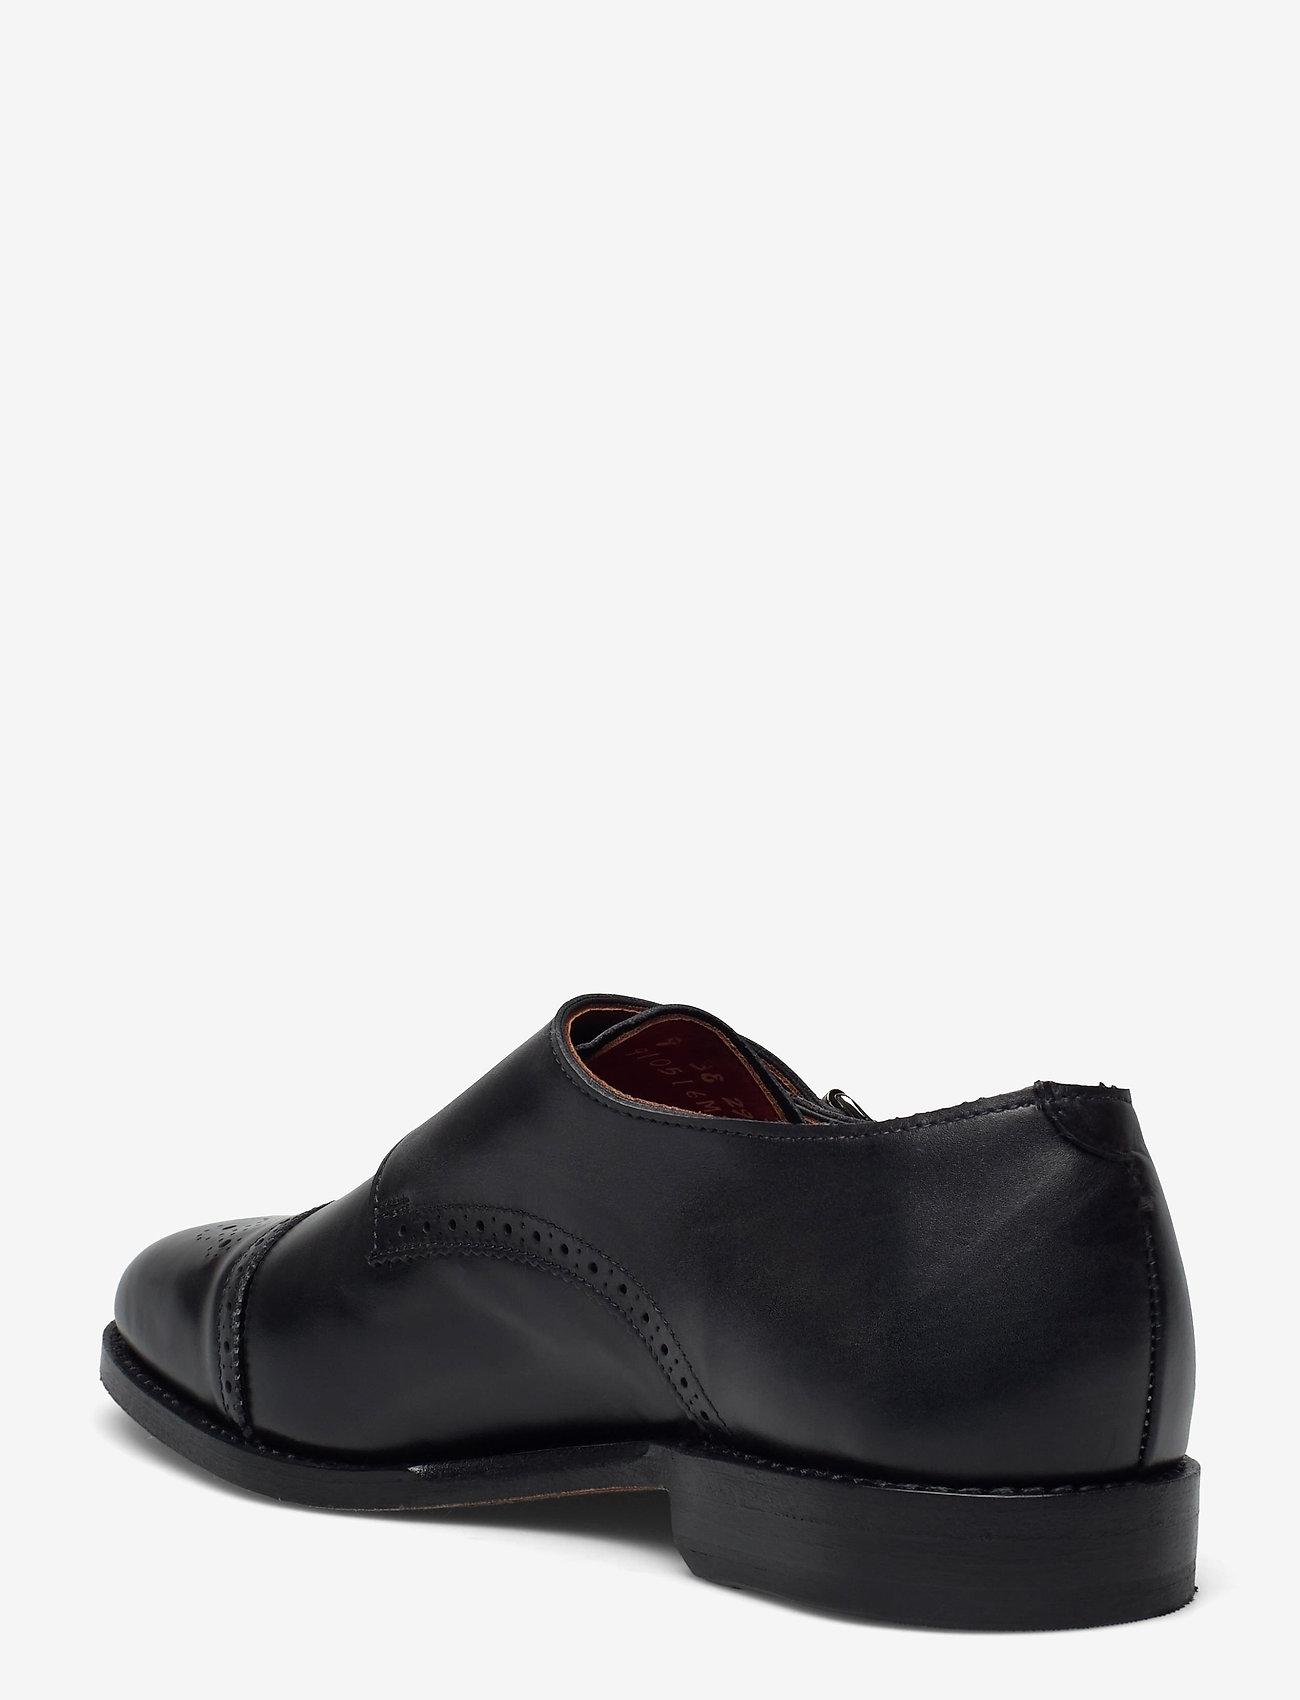 Allen Edmonds - St. John´s - business - black - 2